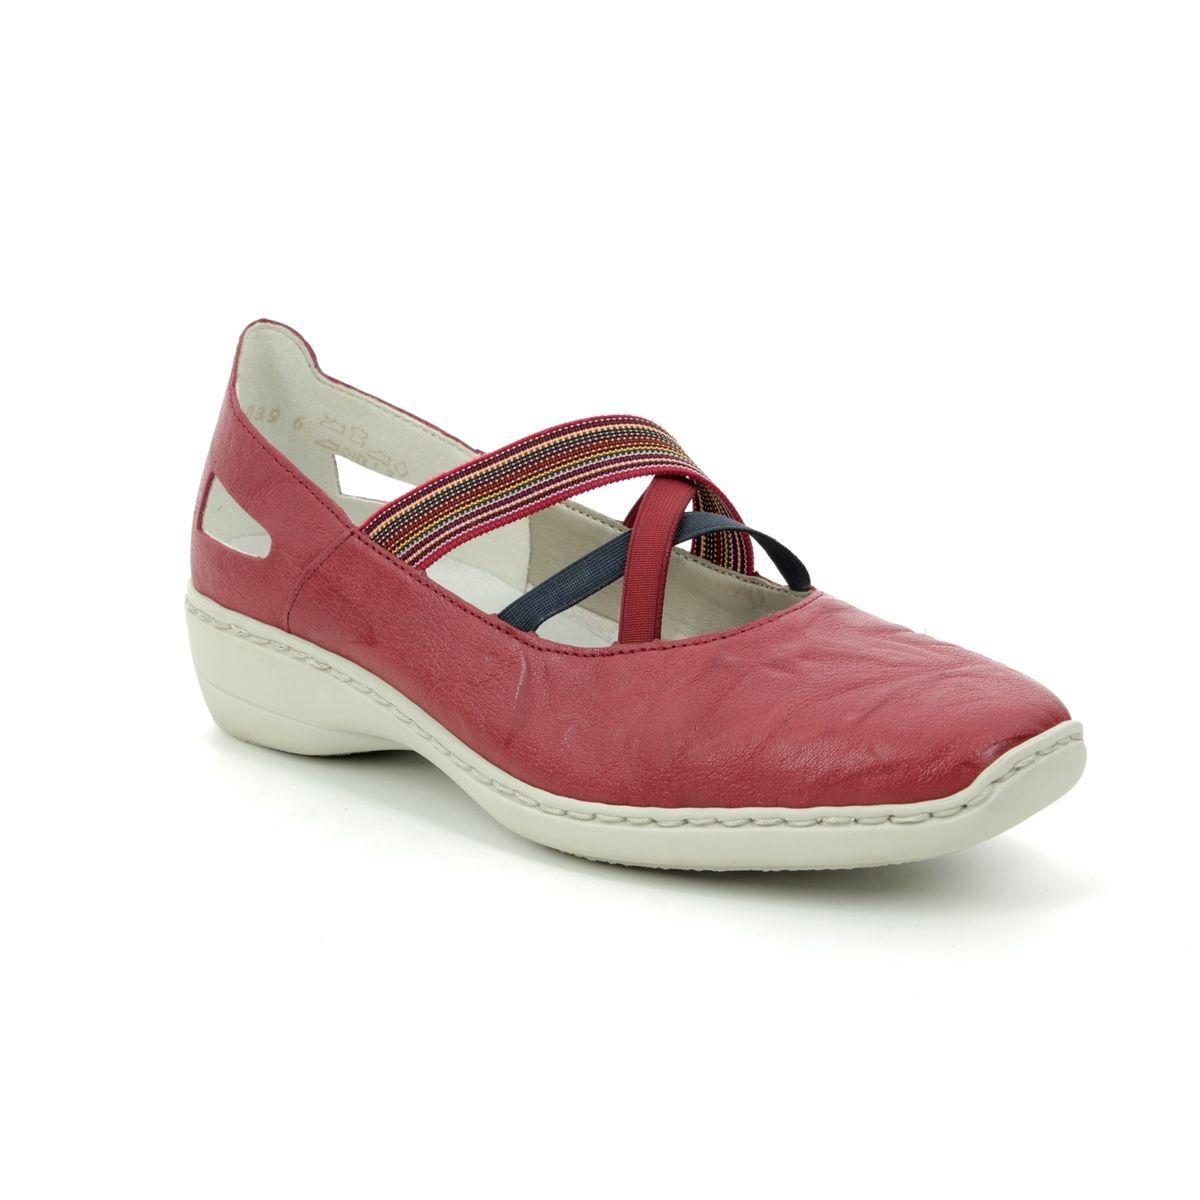 b9dc323b1e205 Rieker Mary Jane Shoes - Red - 413J8-33 DORISFUN